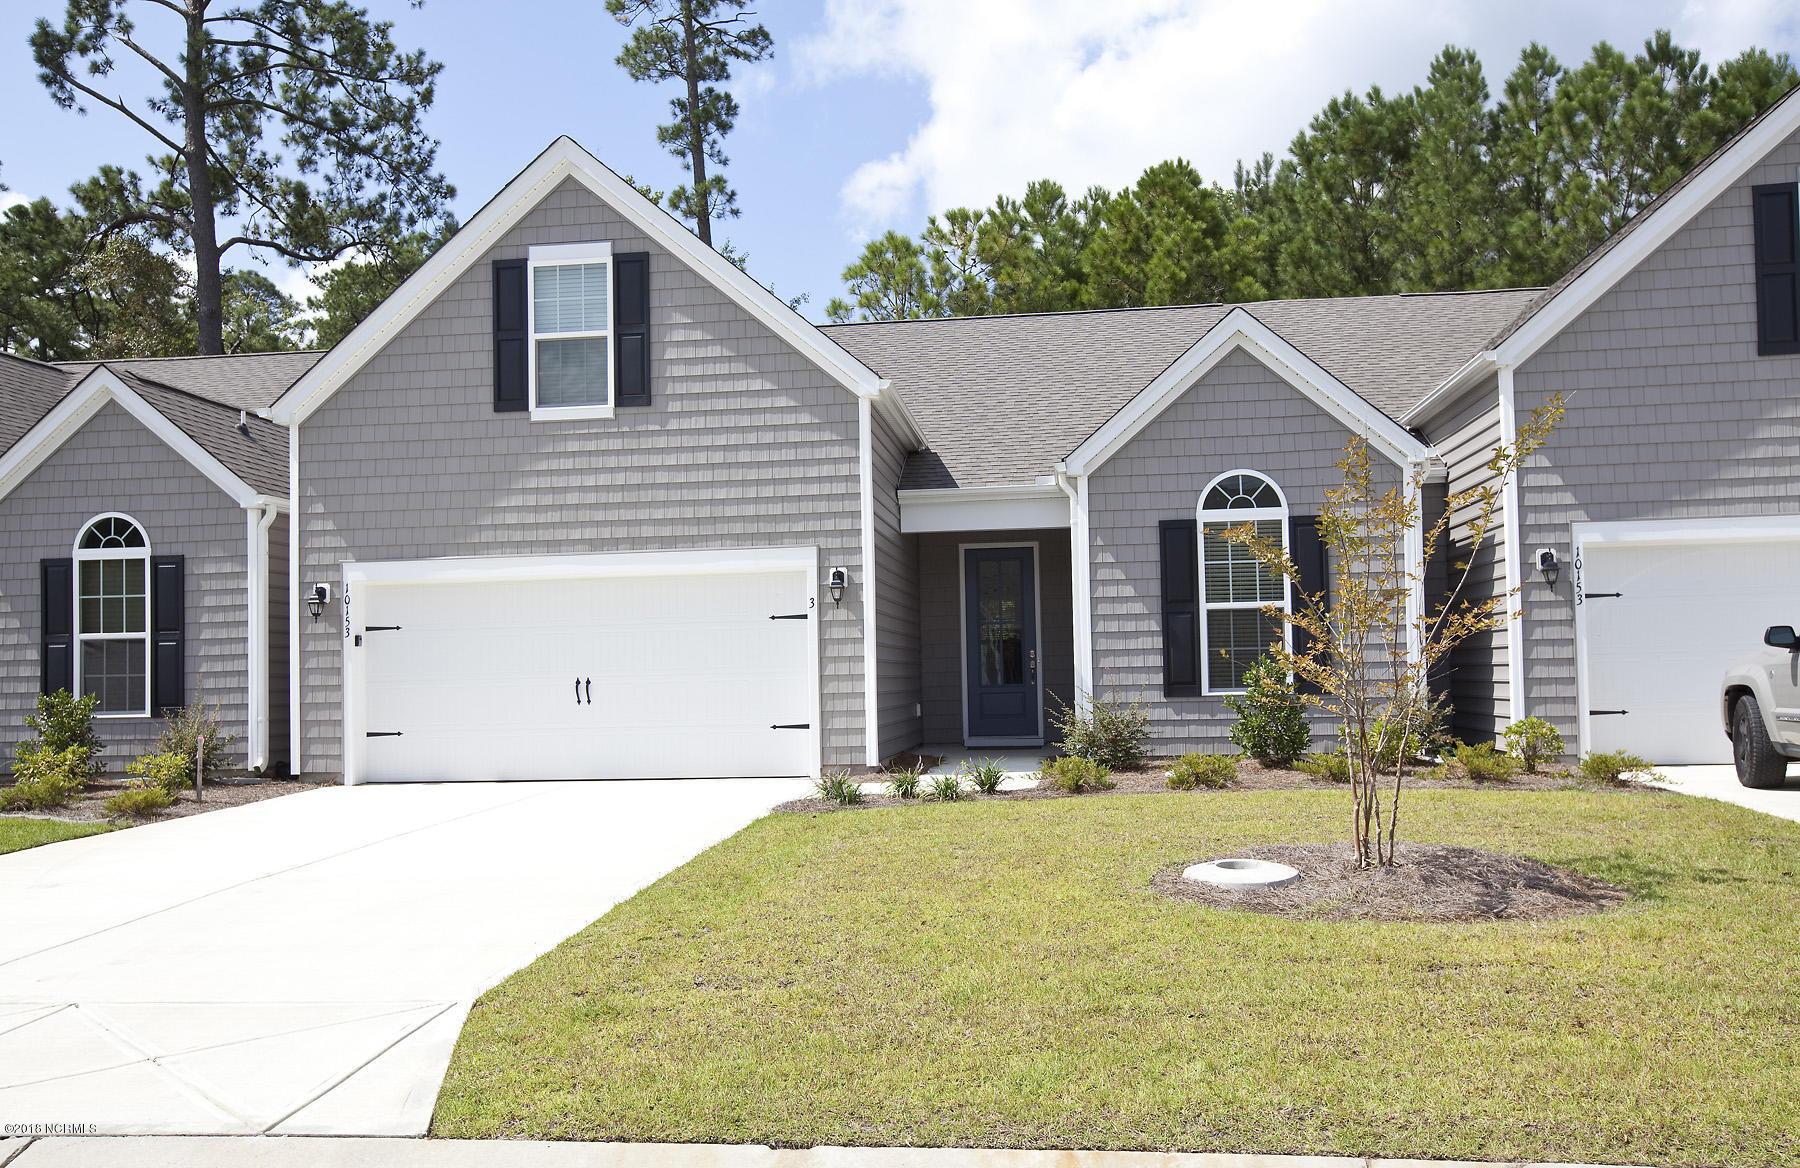 10153 Morecamble Boulevard, Leland, North Carolina 28451, 3 Bedrooms Bedrooms, 8 Rooms Rooms,2 BathroomsBathrooms,Residential,For Sale,Morecamble,100136060